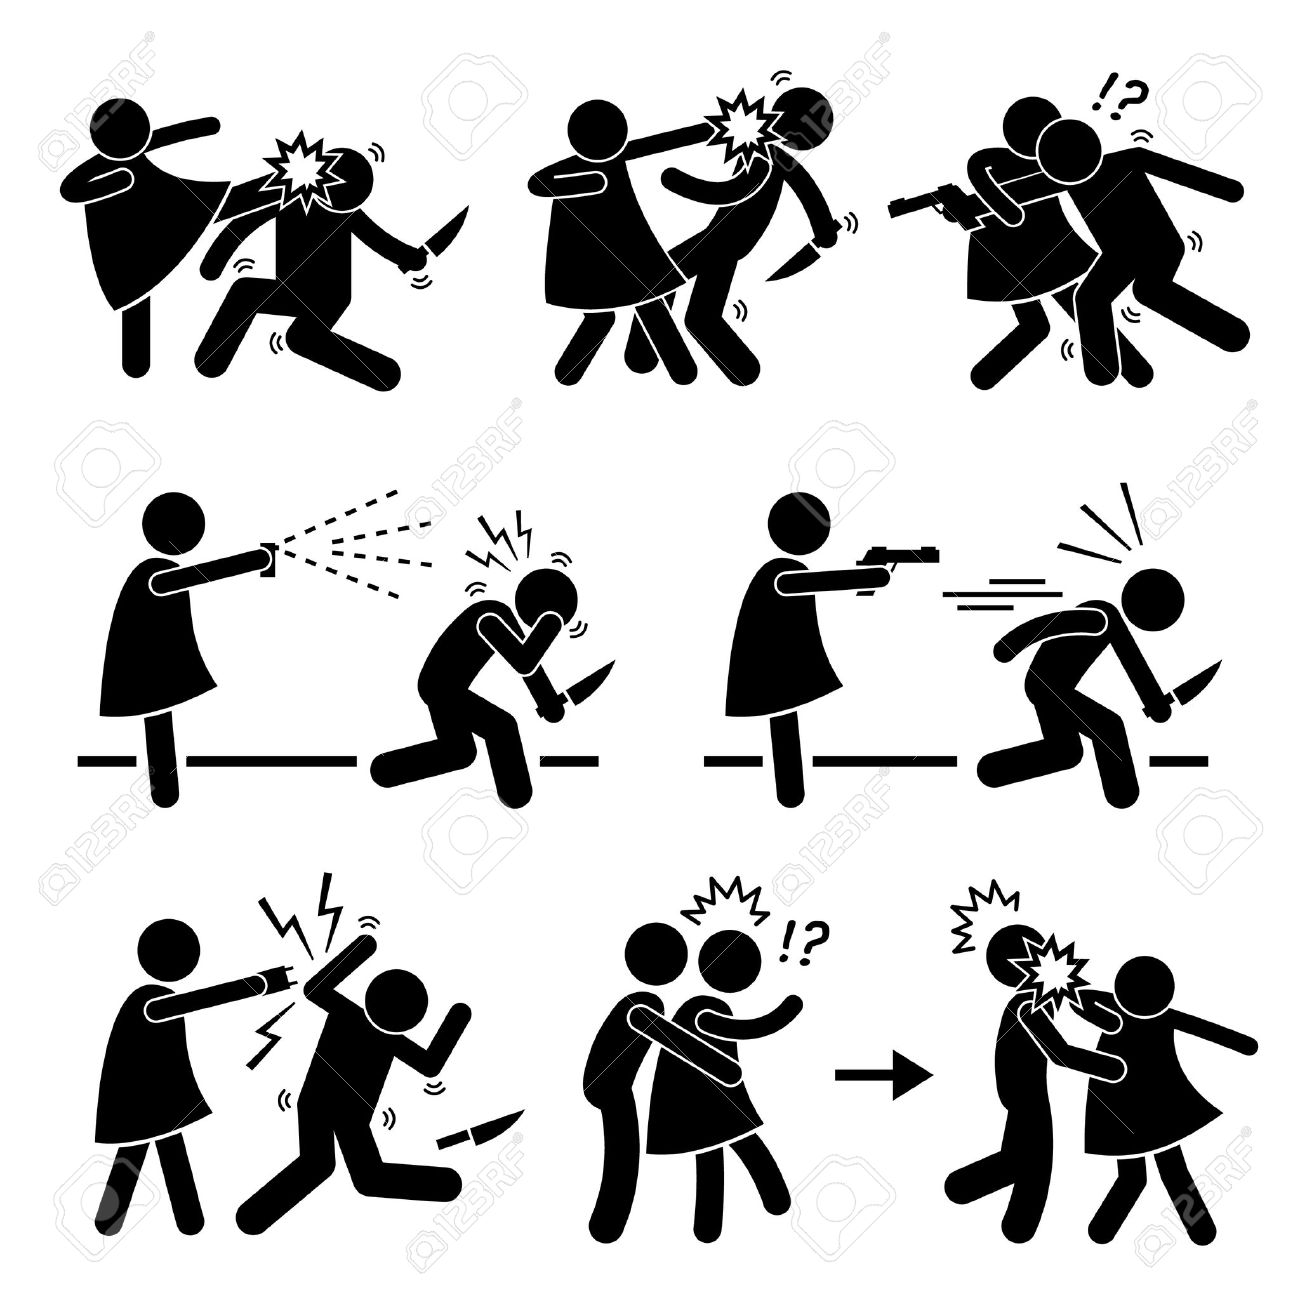 Get e-book Self Defense